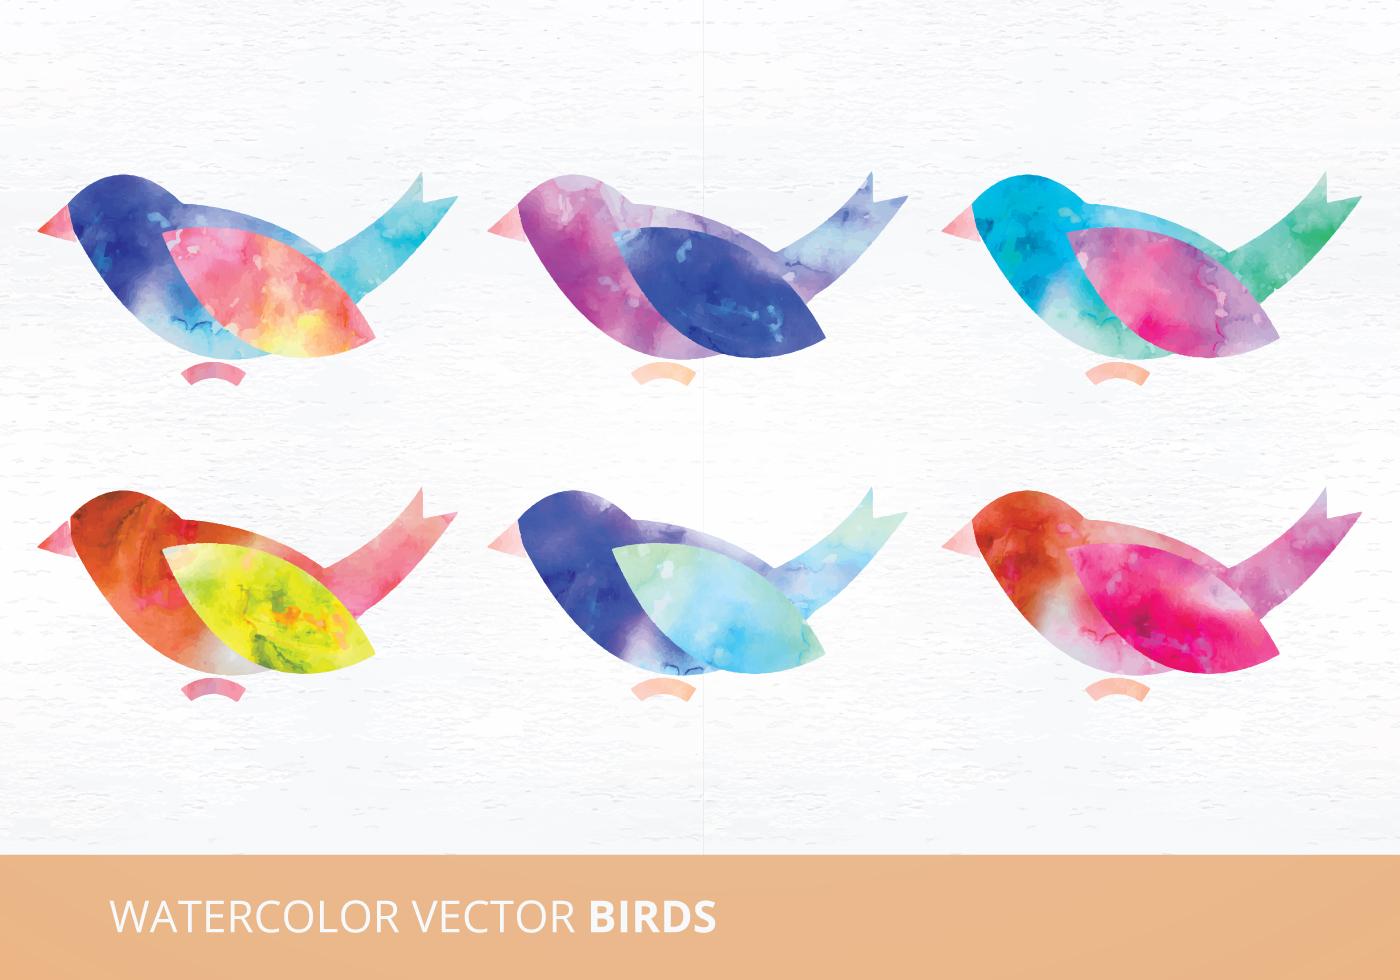 Watercolor Birds Vector Illustration - Download Free ...